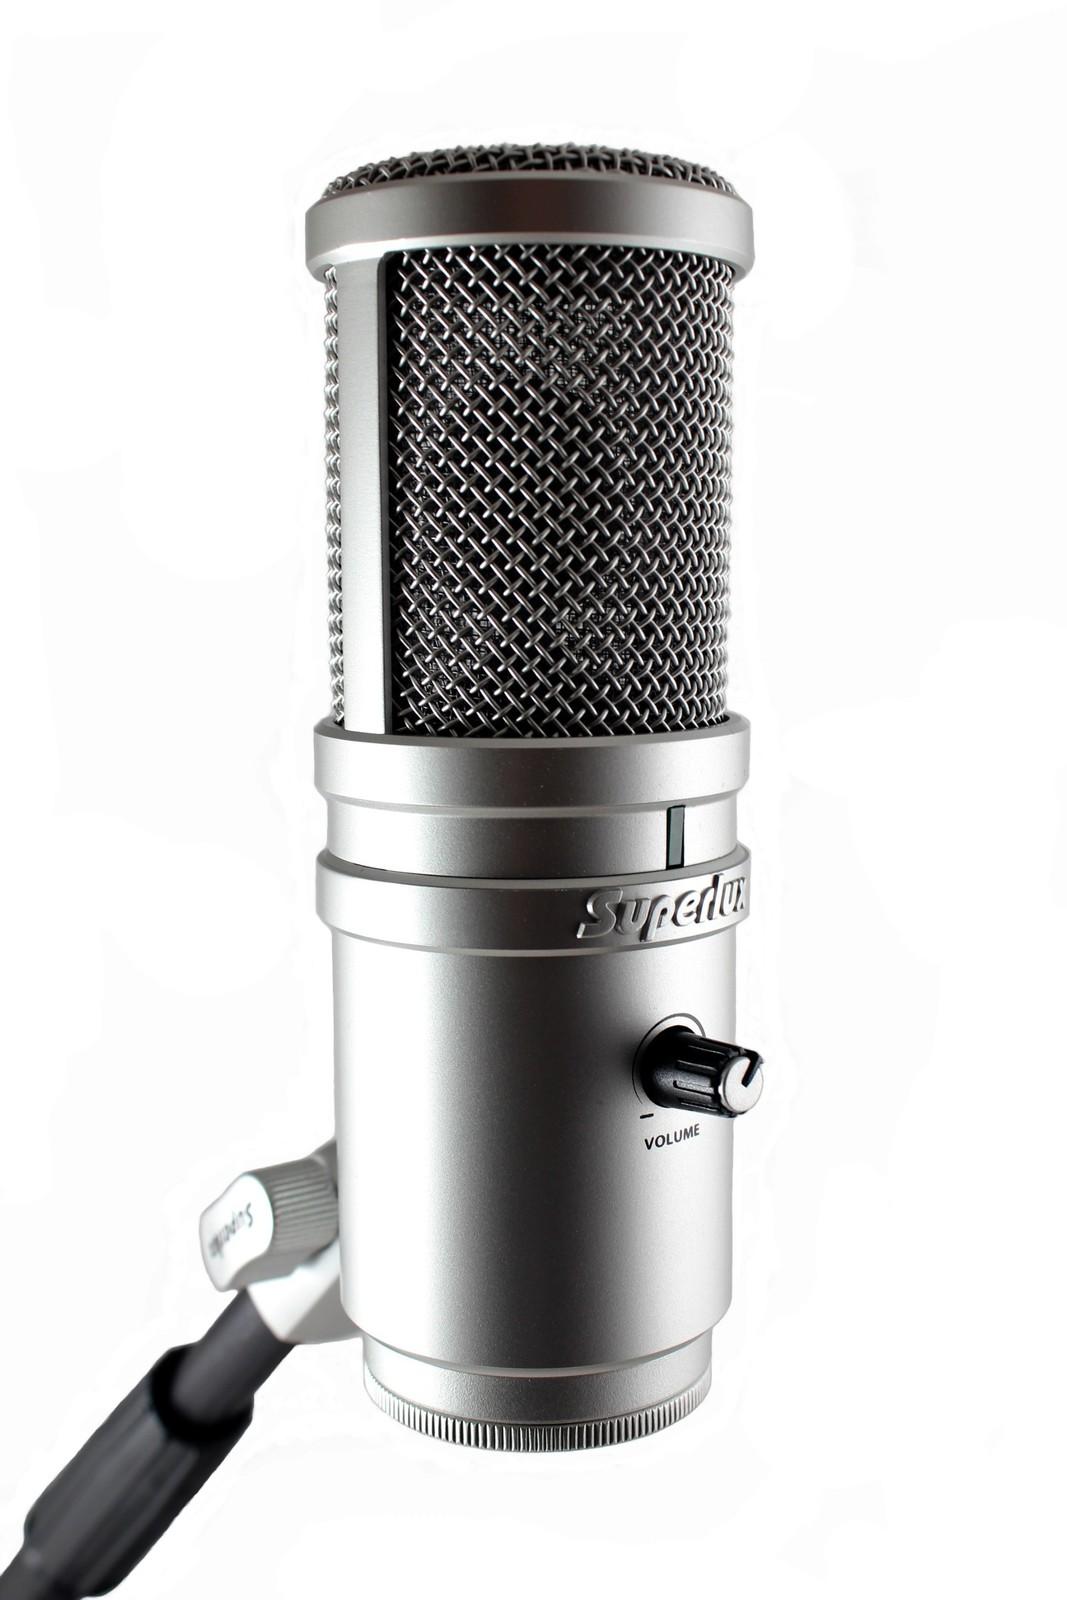 Superlux E205U USB microphone image